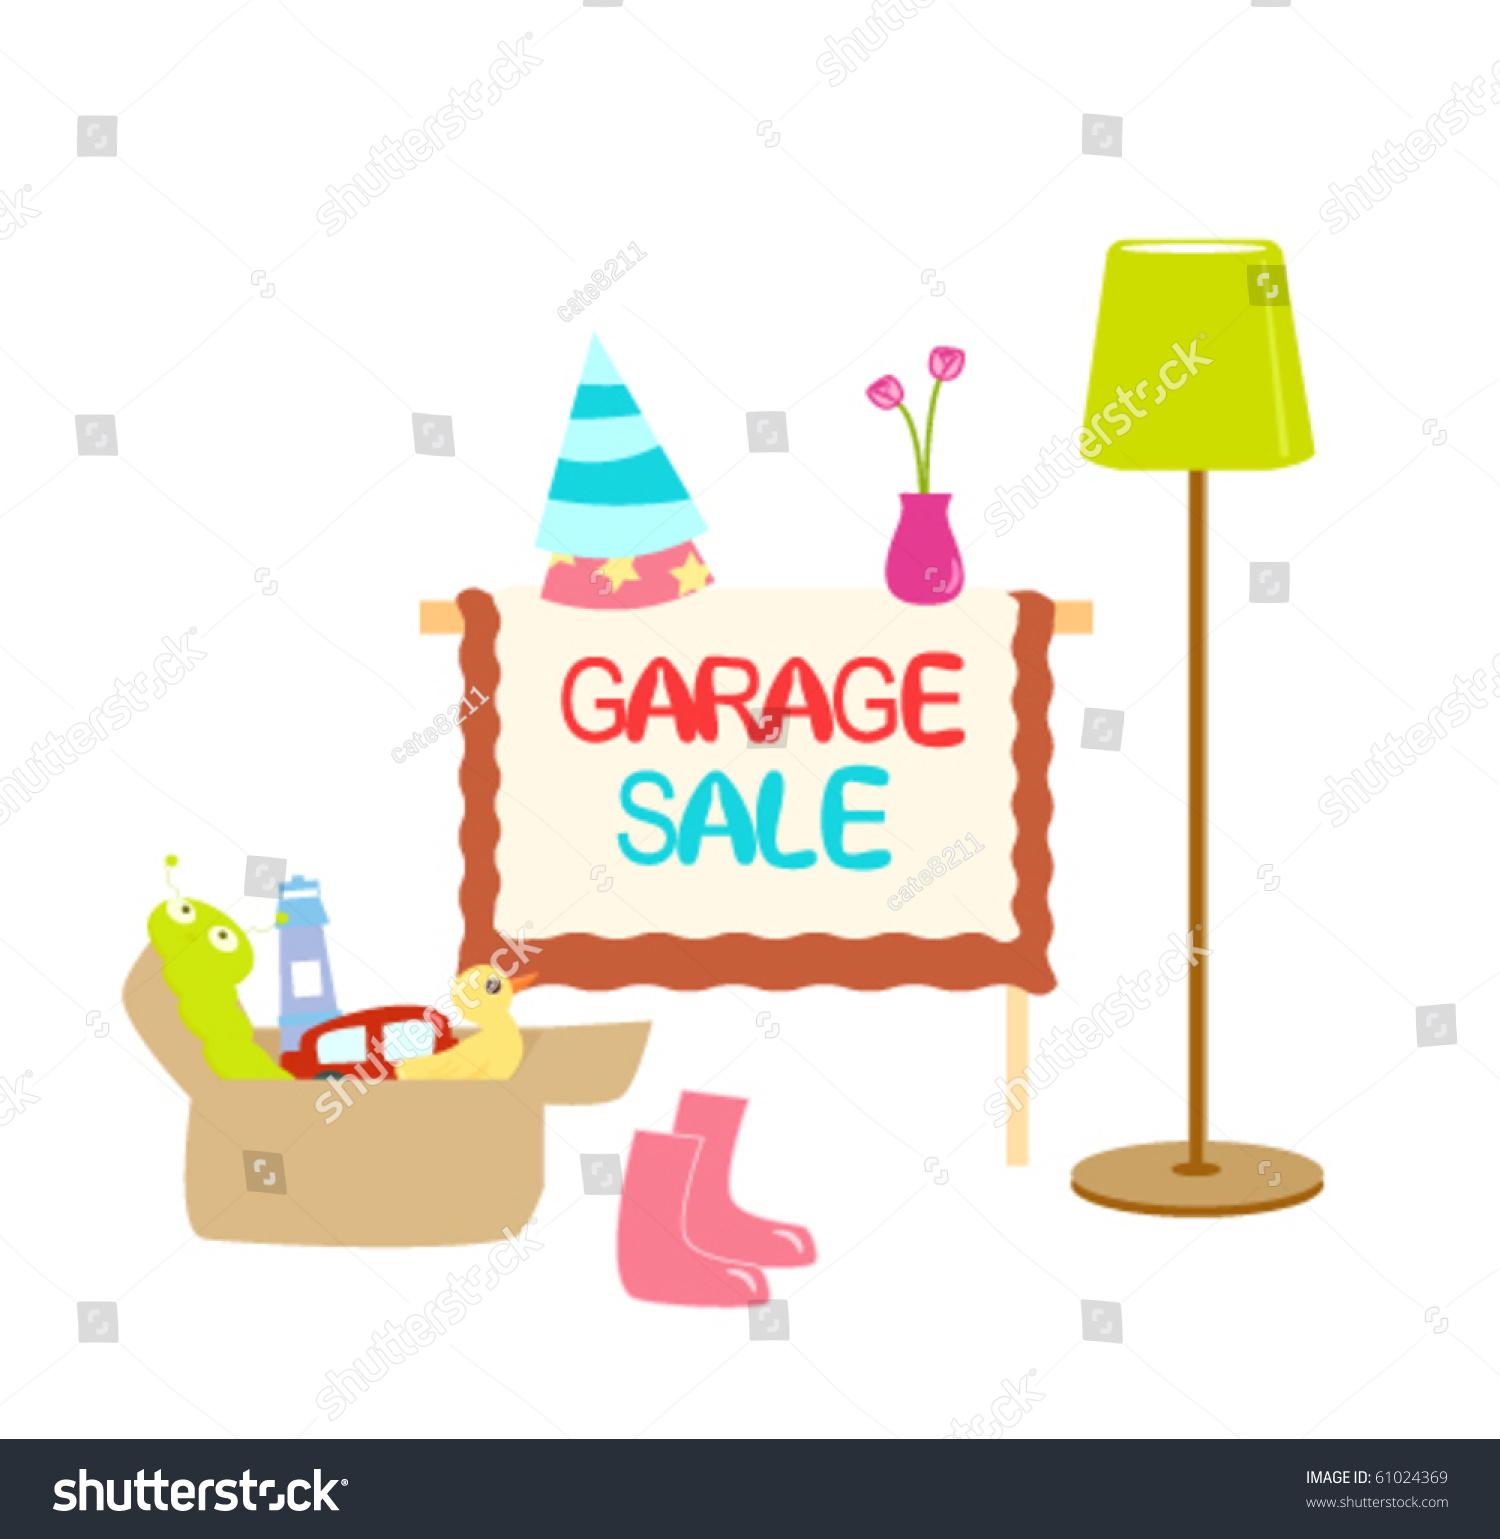 illustration of garage sale items with sign   garage sale